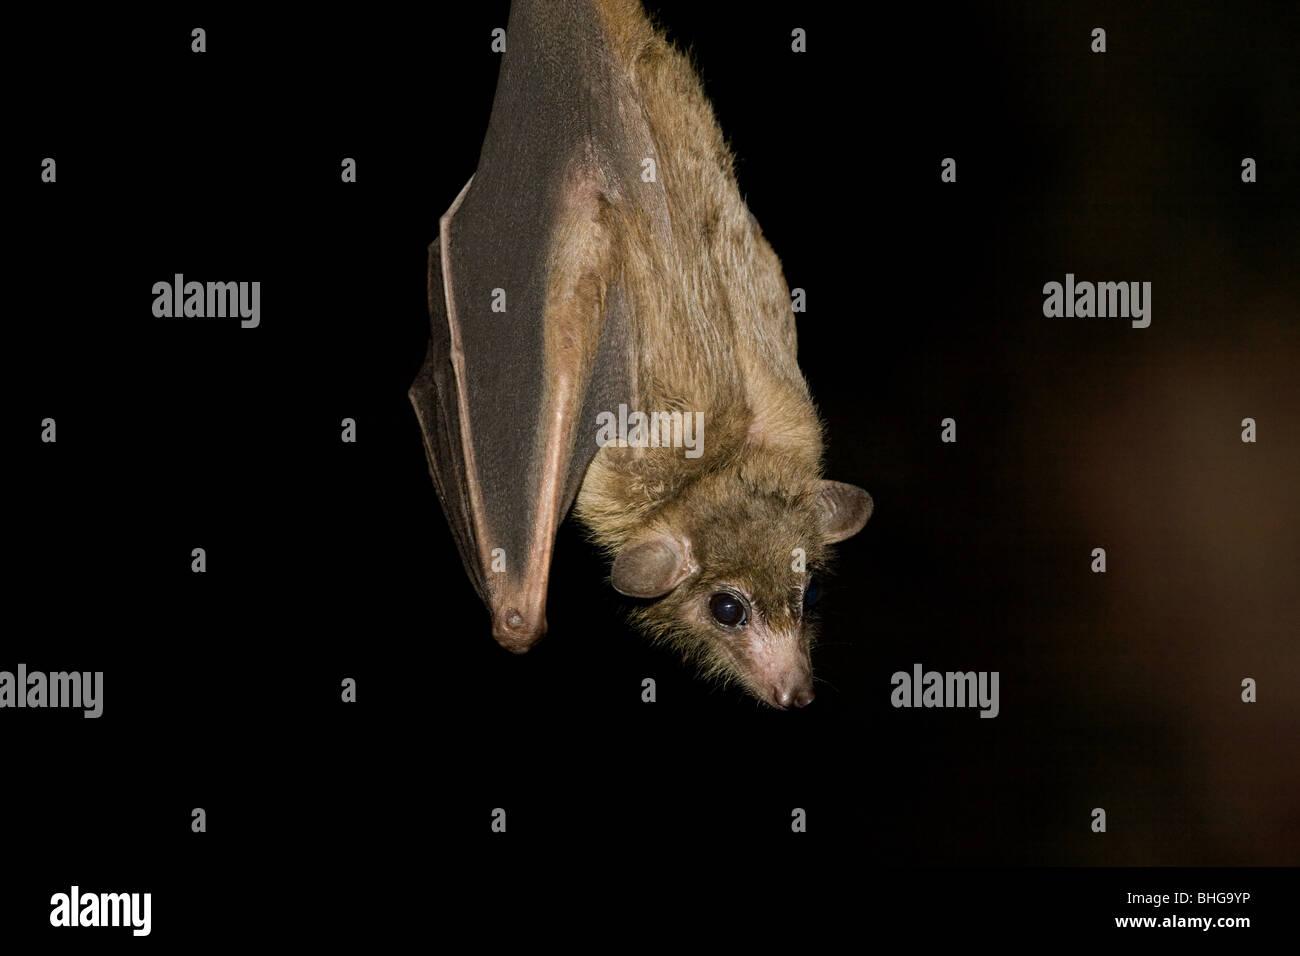 Egyptian Fruit Bat Stock Photo